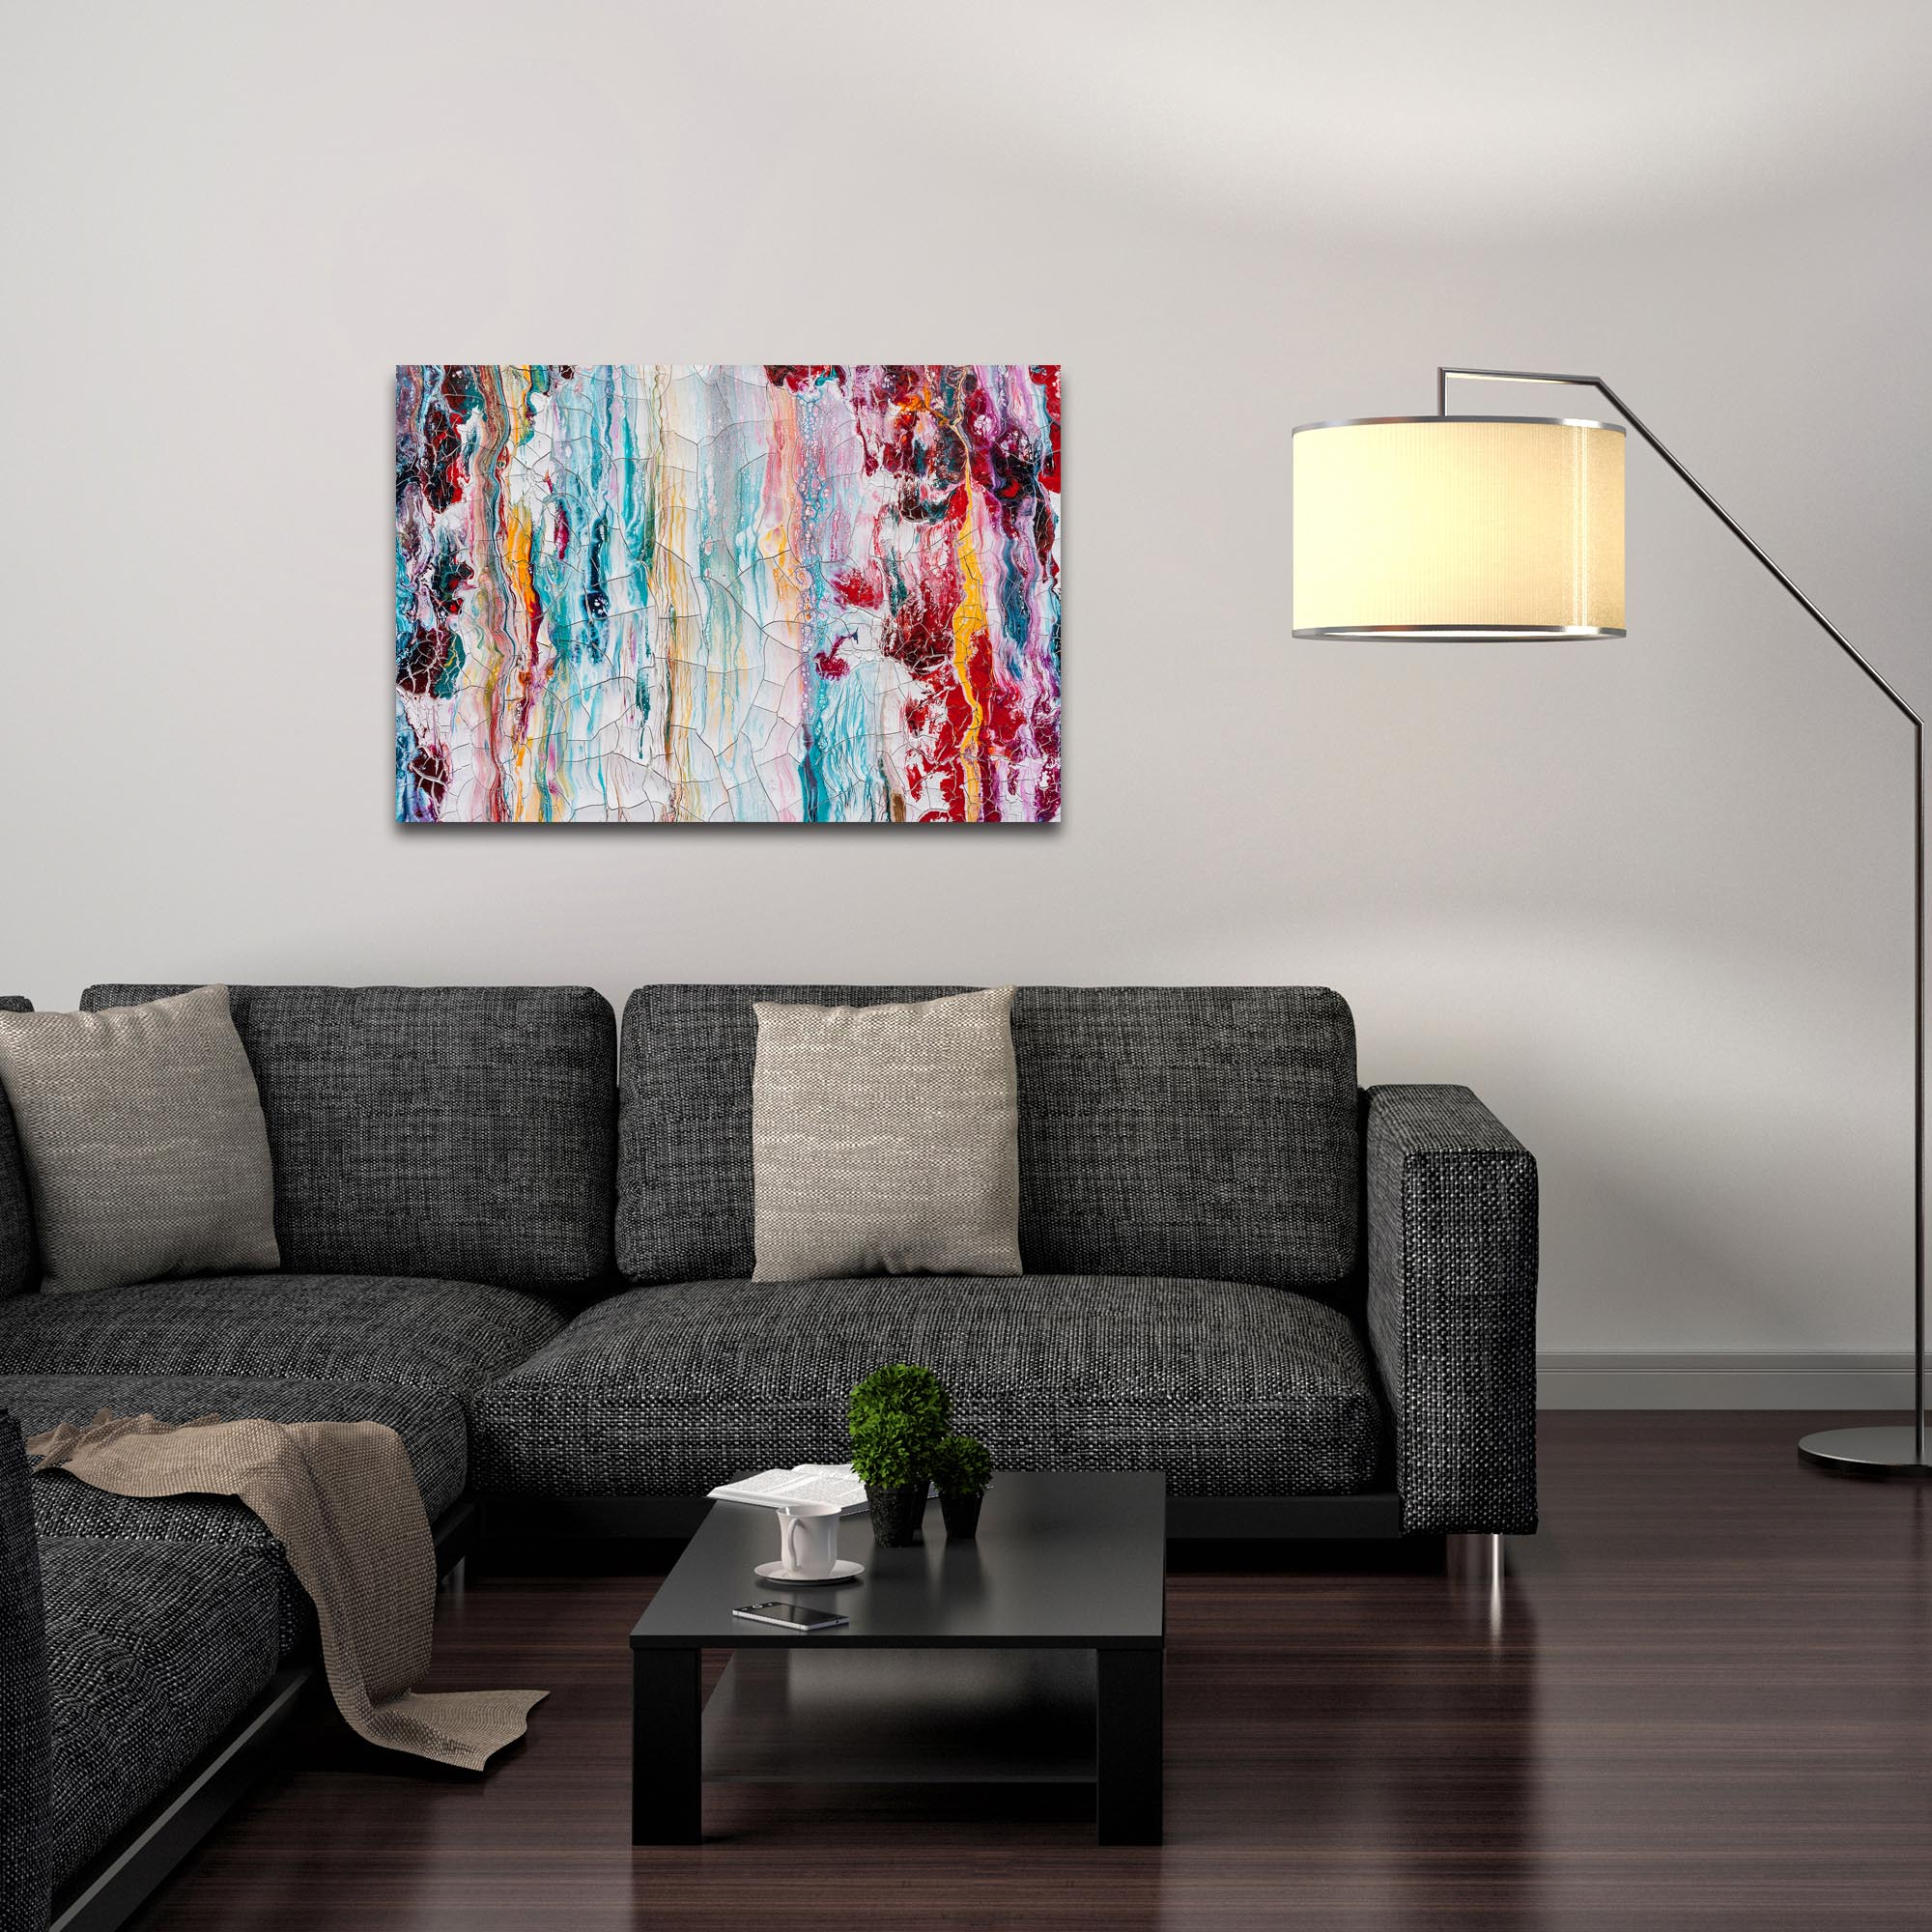 Abstract Wall Art 'Cracks 1' - Urban Decor on Metal or Plexiglass - Lifestyle View